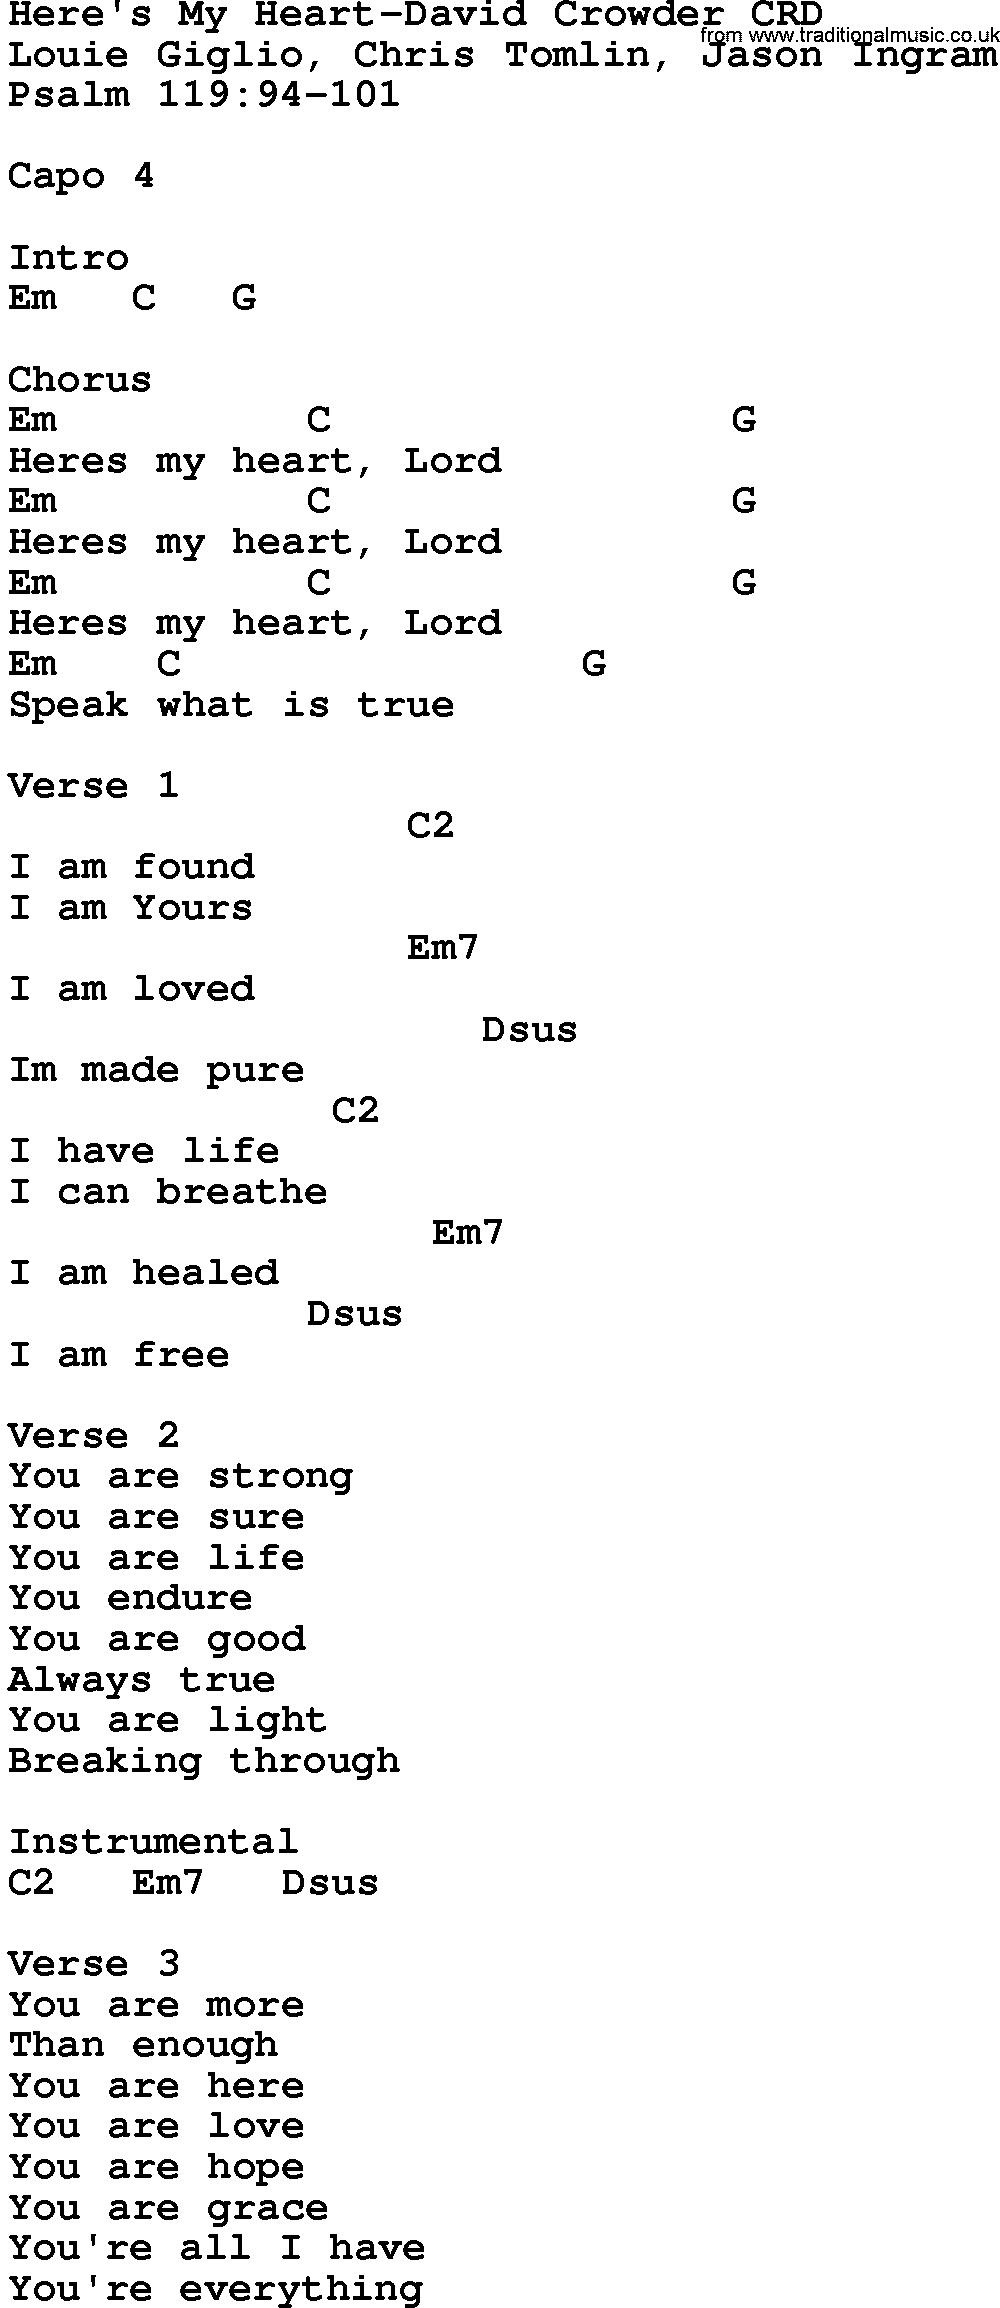 Gospel Song Heres My Heart David Crowder Lyrics And Chords